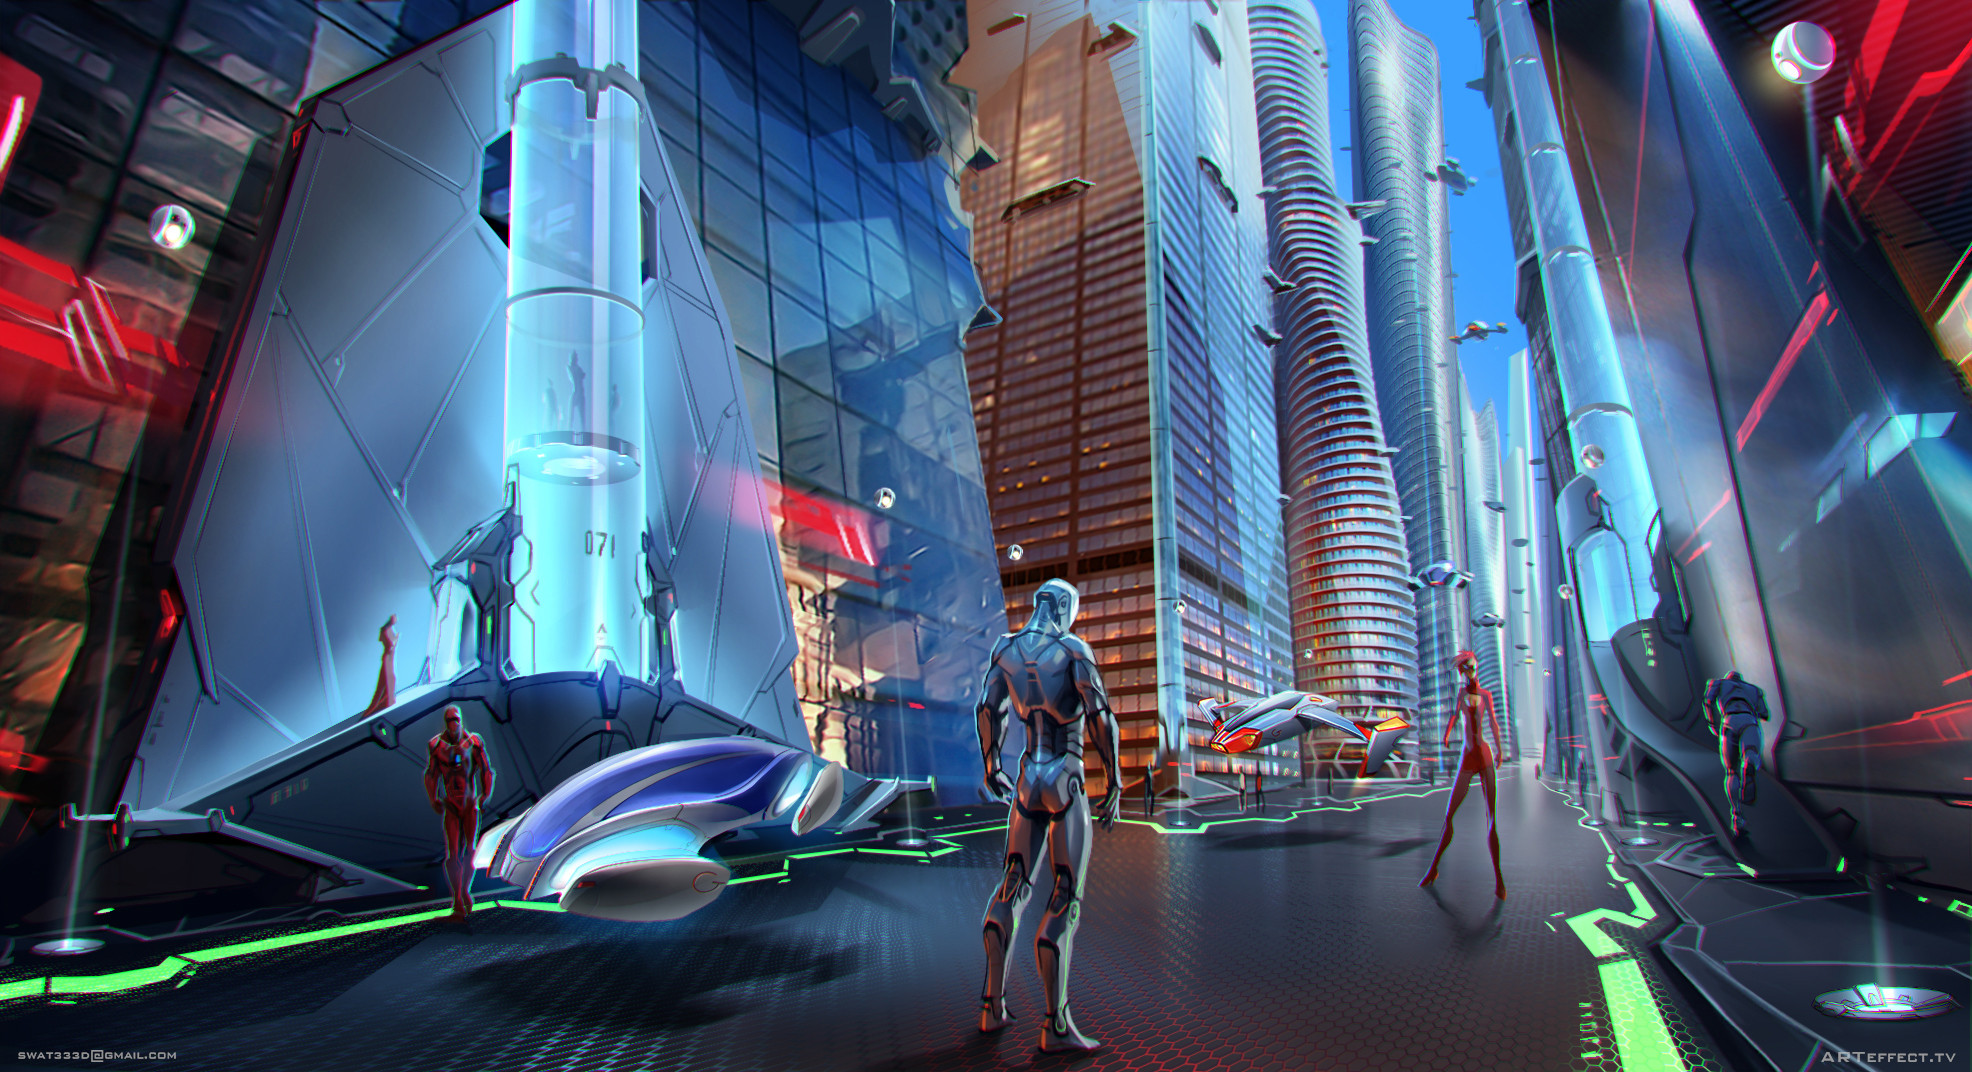 Parametric City - at street